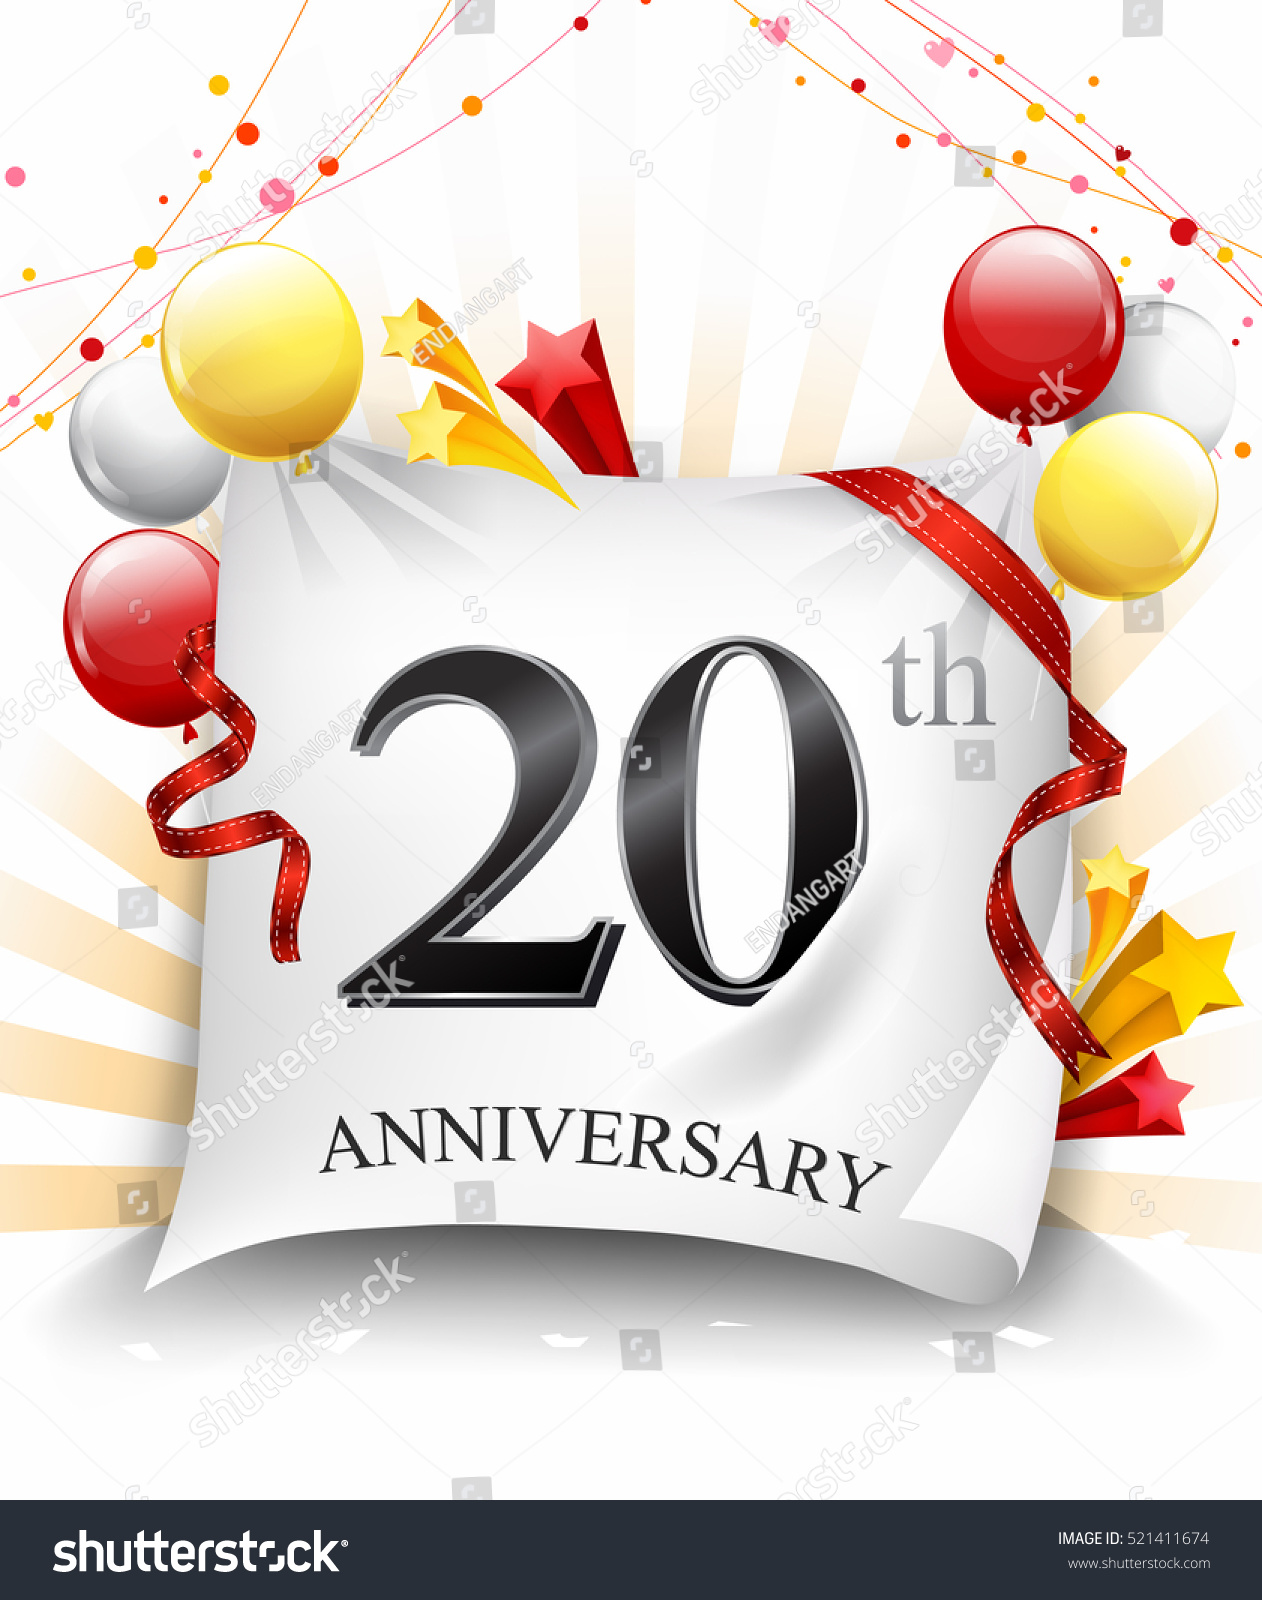 20 Years Anniversary Celebration Design On Stock Vector